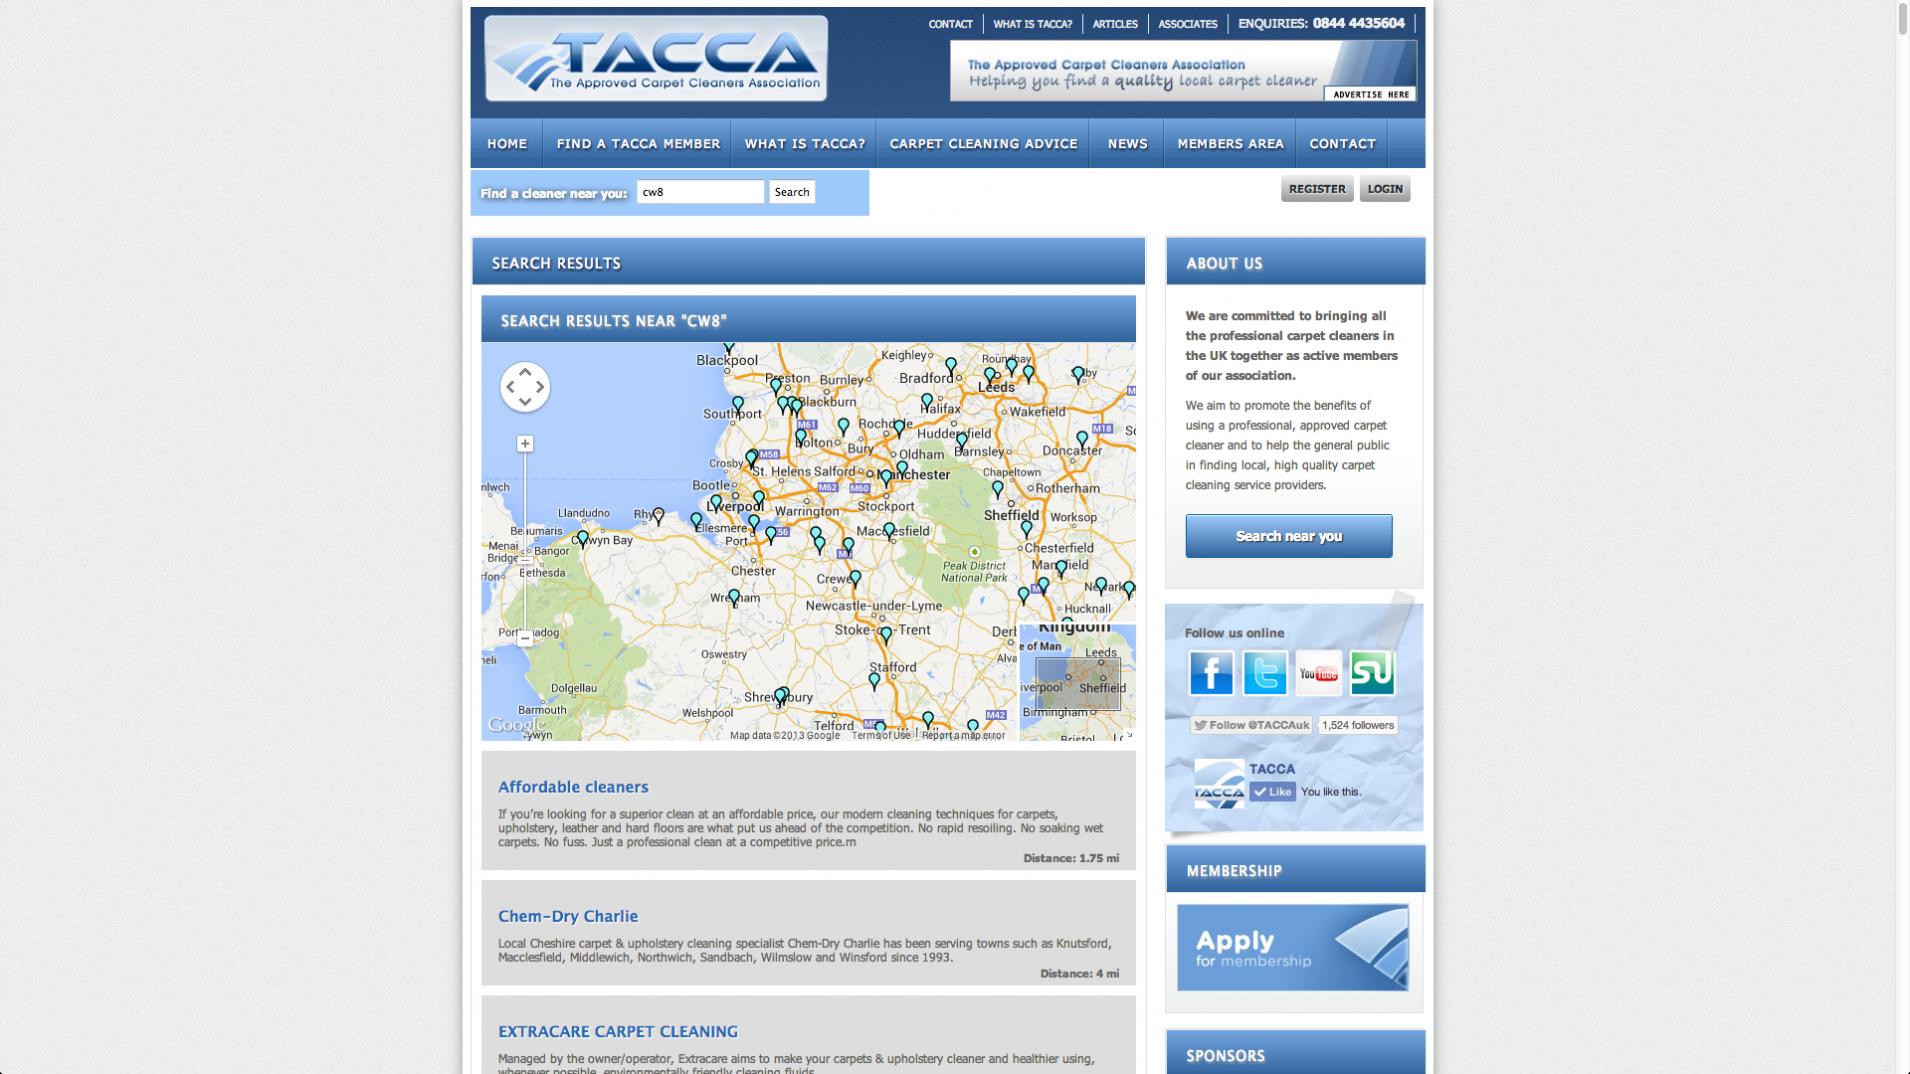 Screen Shot 2013 12 23 at 16.36.41 - Webdesign for UK trade association